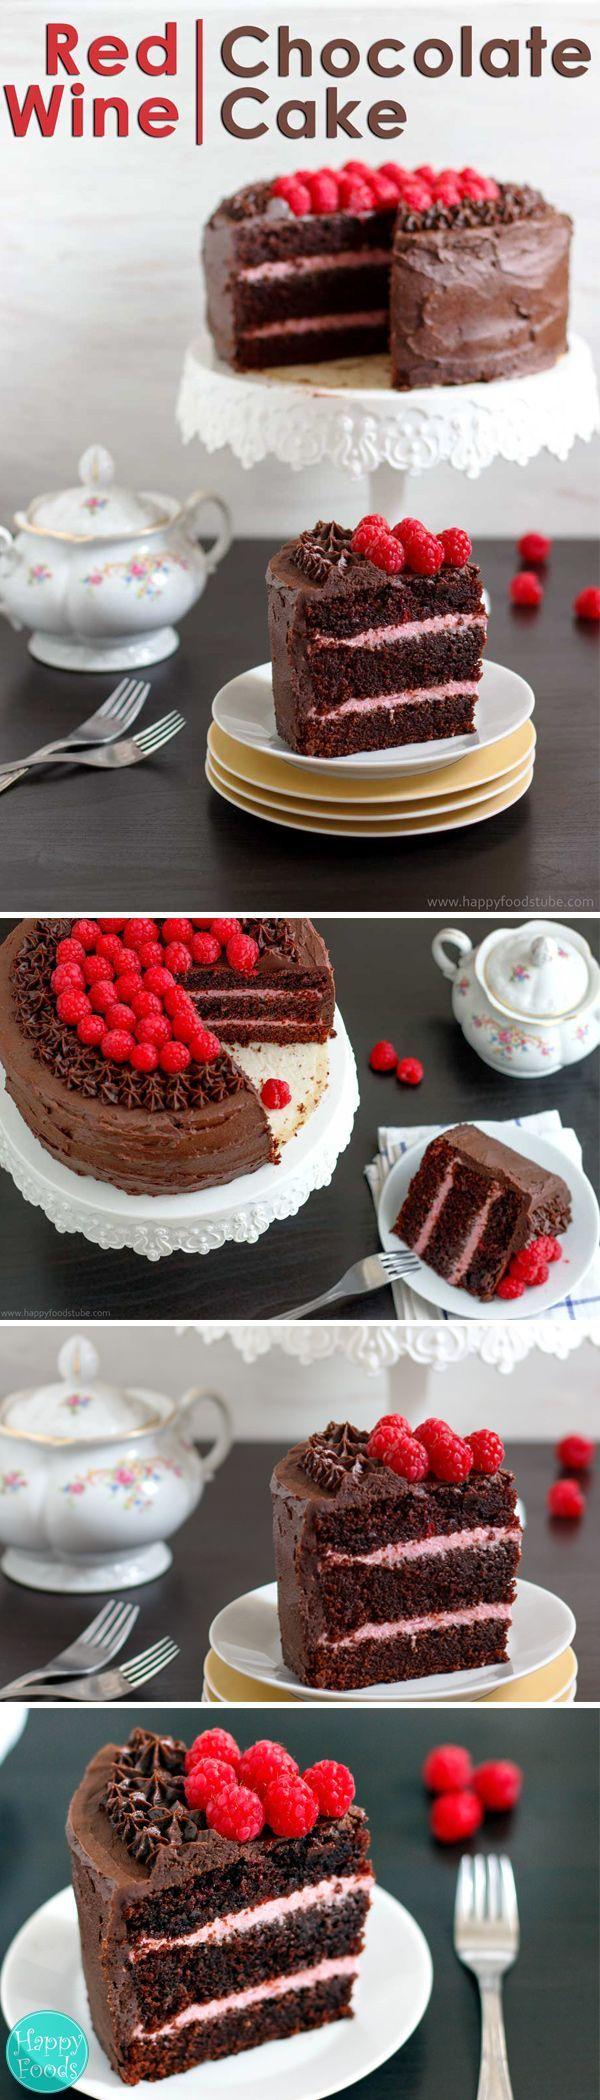 Red Wine Chocolate Raspberry Cake Recipe Happy Foods Tube Recipe Chocolate Raspberry Cake Recipe Wine Cake Chocolate Raspberry Cake